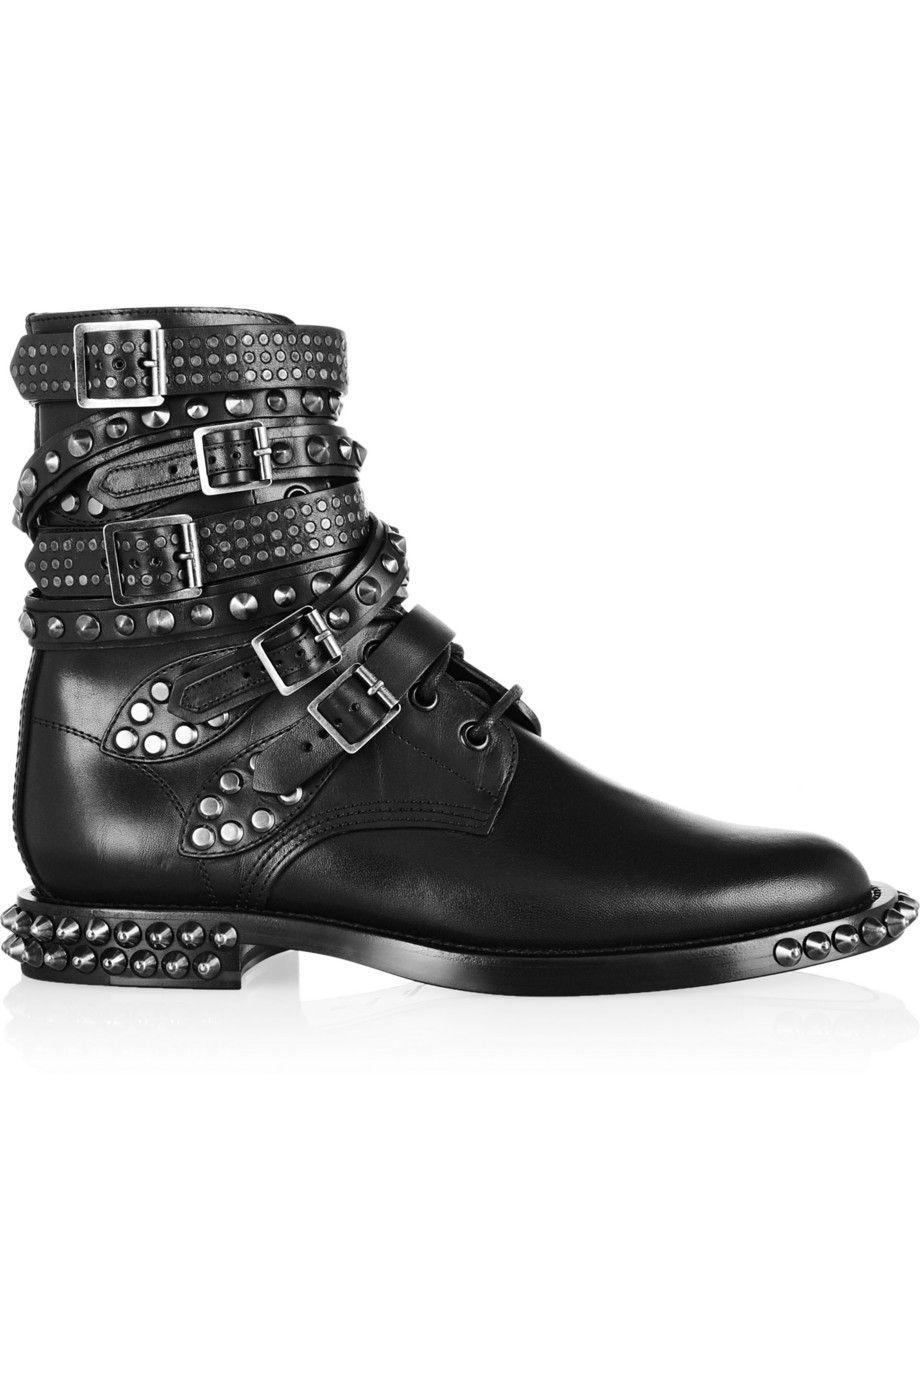 5536a7f7df3 Saint Laurent | Signature Rangers studded leather boots | STYLISH ...